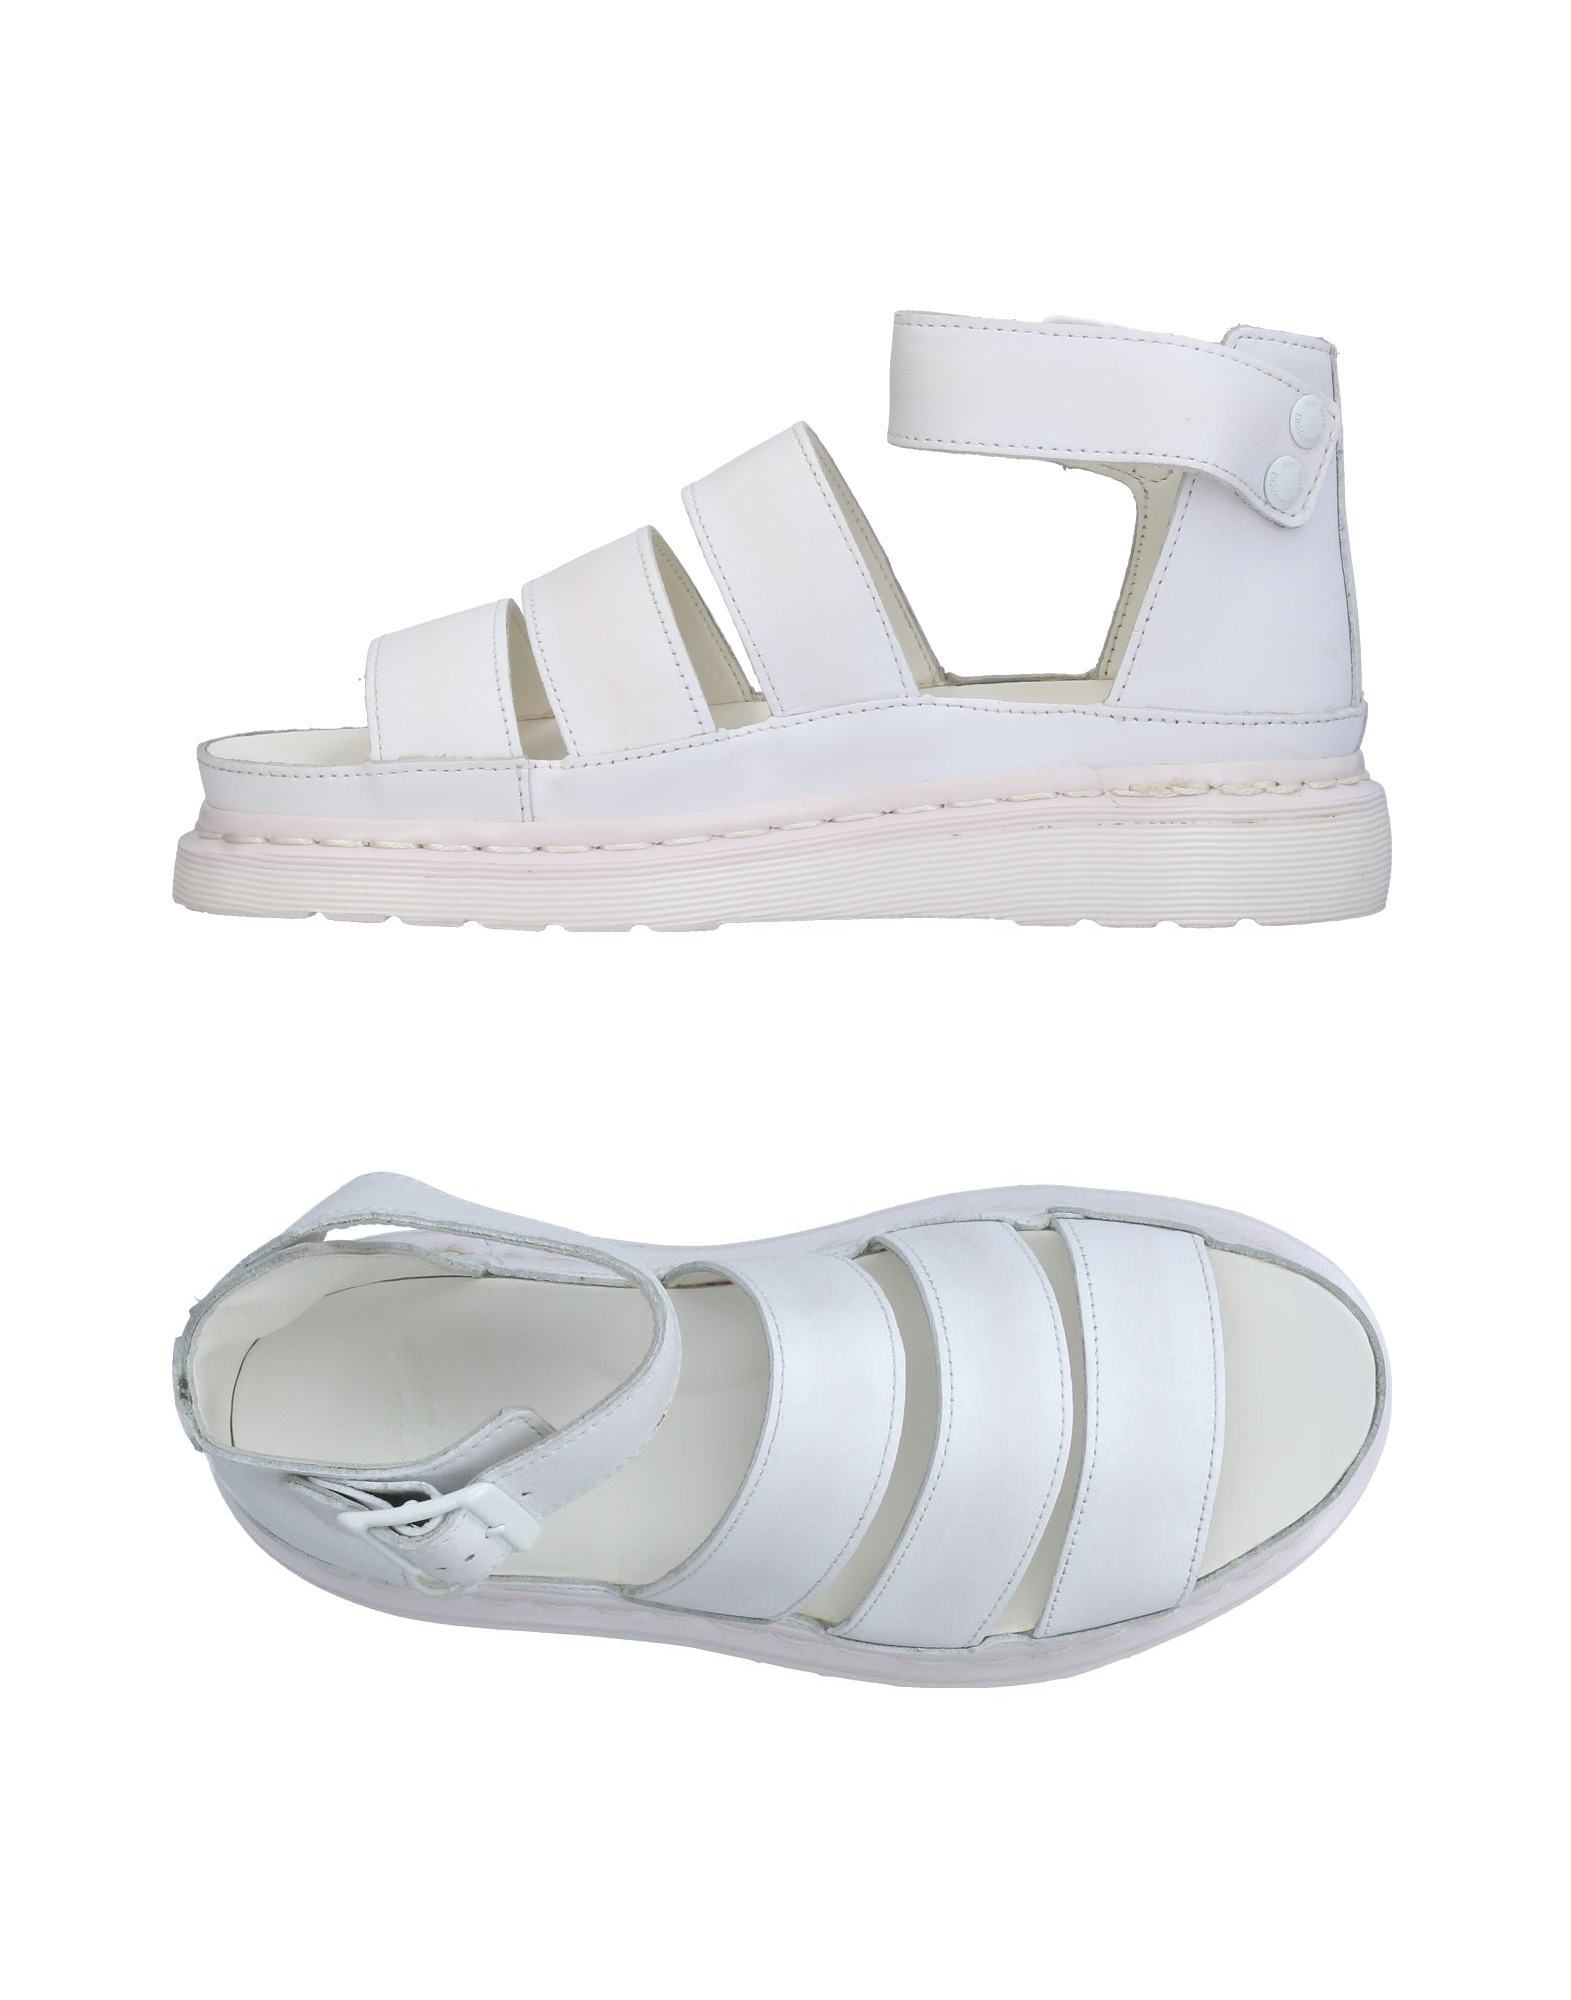 Dr. Martens Sandals - Women Dr. Sandals Martens Sandals Dr. online on  Australia - 11341810NU 9925e9